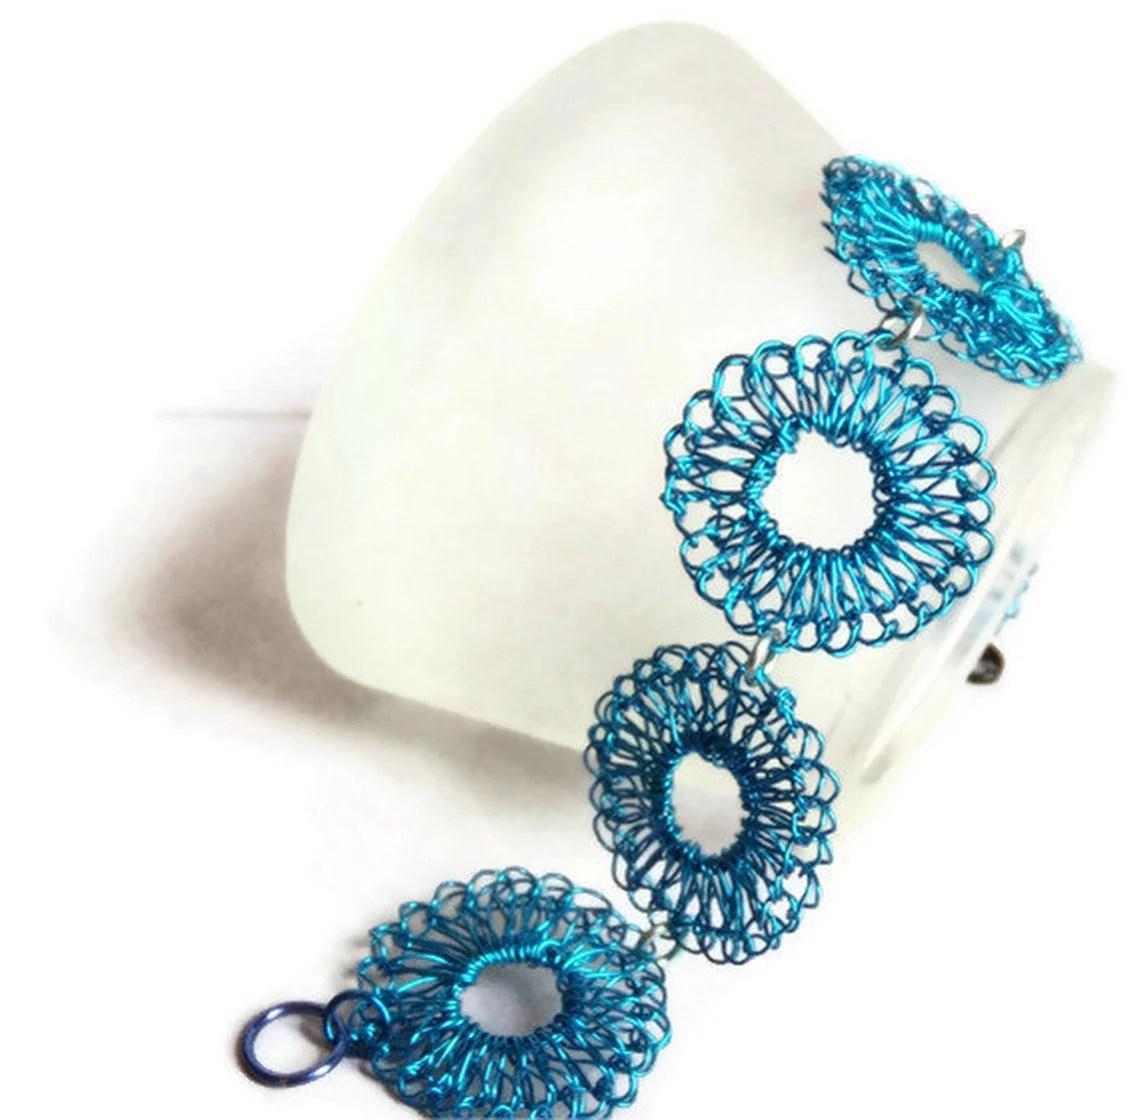 Hand Crochet Wire Ocean Blue Bracelet by PrayerMonkey - PrayerMonkey